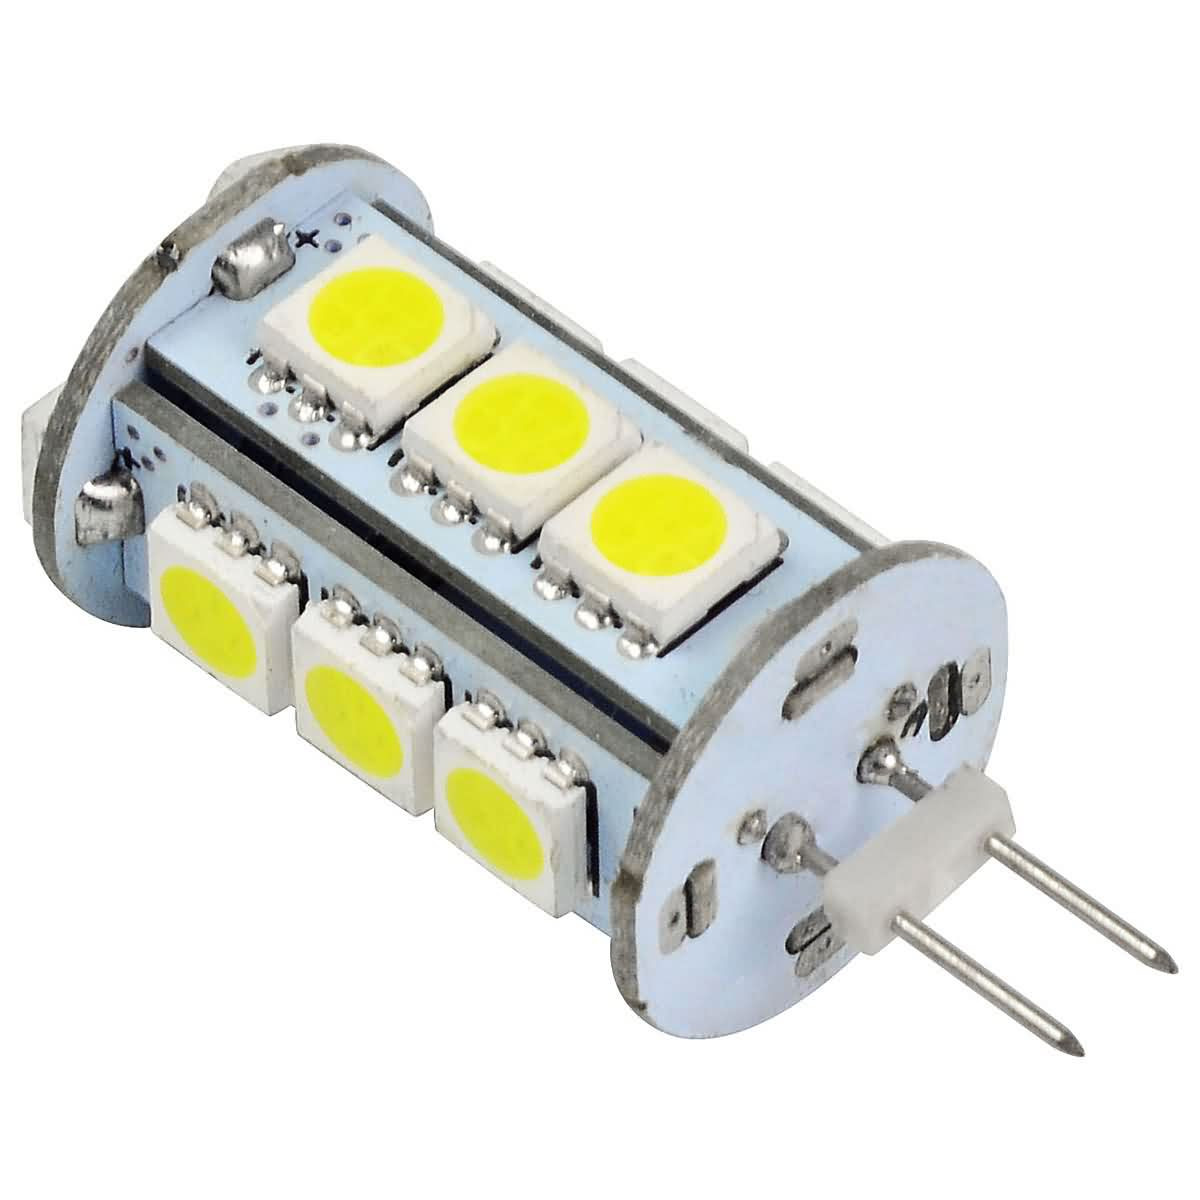 g4 2 5w led light 15x 5050 smd leds led bulb in cool white energy saving lamp led lights. Black Bedroom Furniture Sets. Home Design Ideas